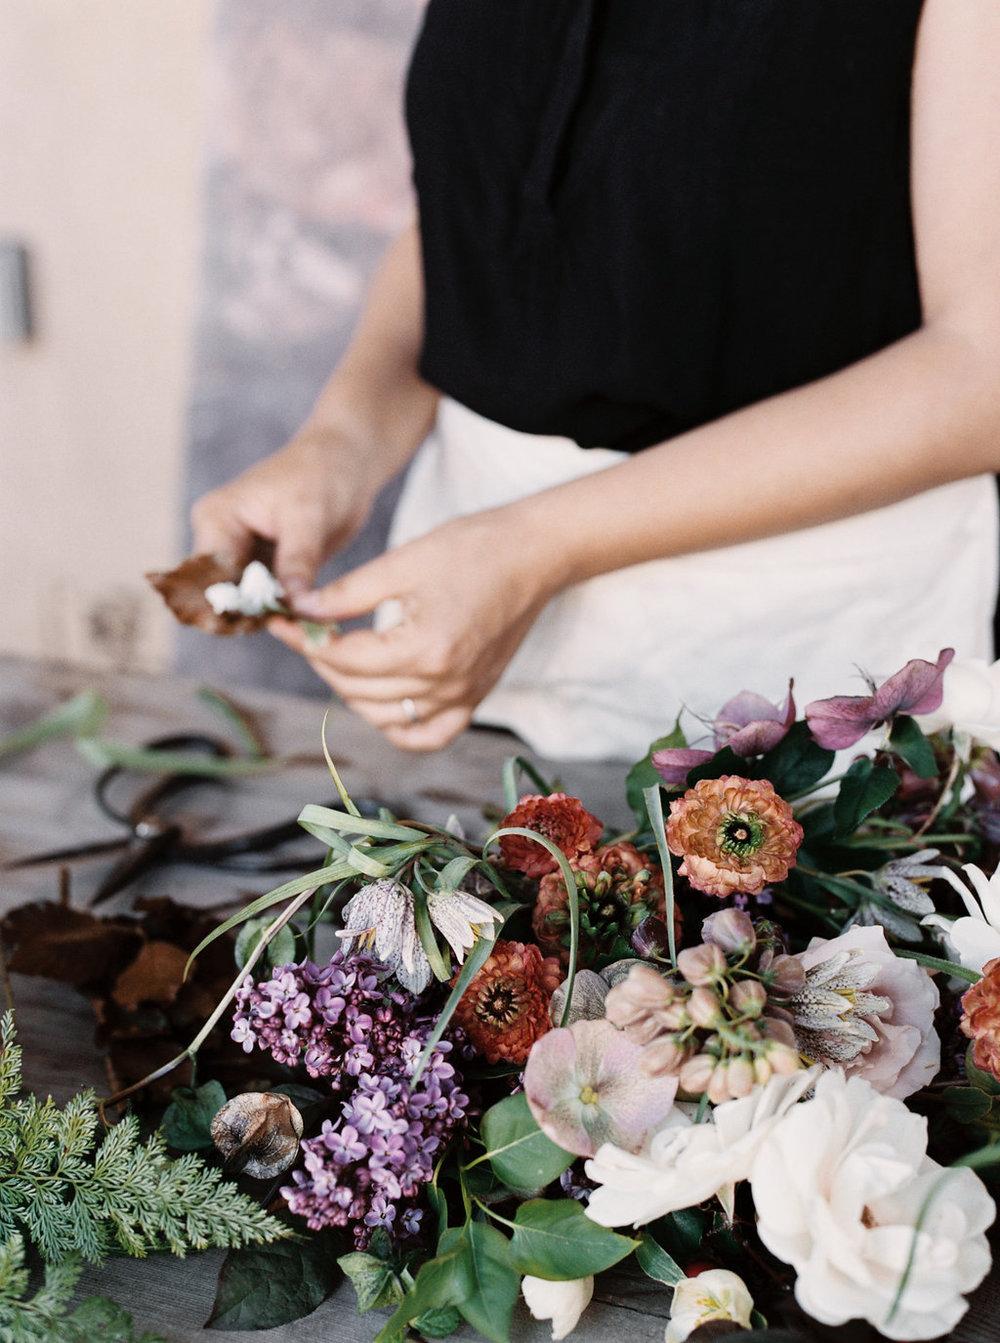 Amy-nicole-floral-lara-lam-38.jpg